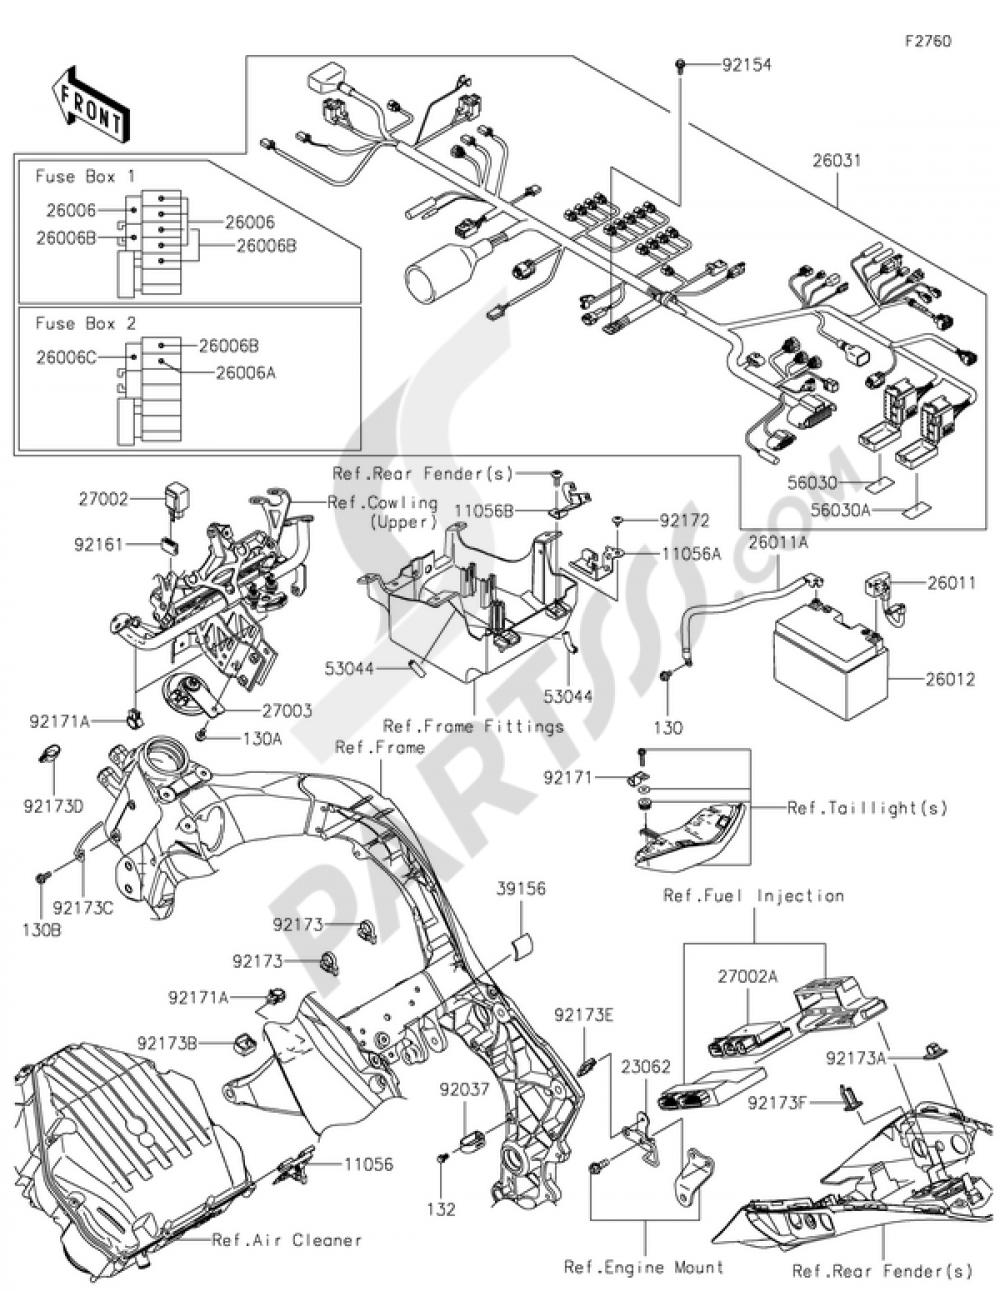 Groovy Chassis Electrical Equipment Kawasaki Z1000Sx 2015 Wiring Cloud Xeiraioscosaoduqqnet